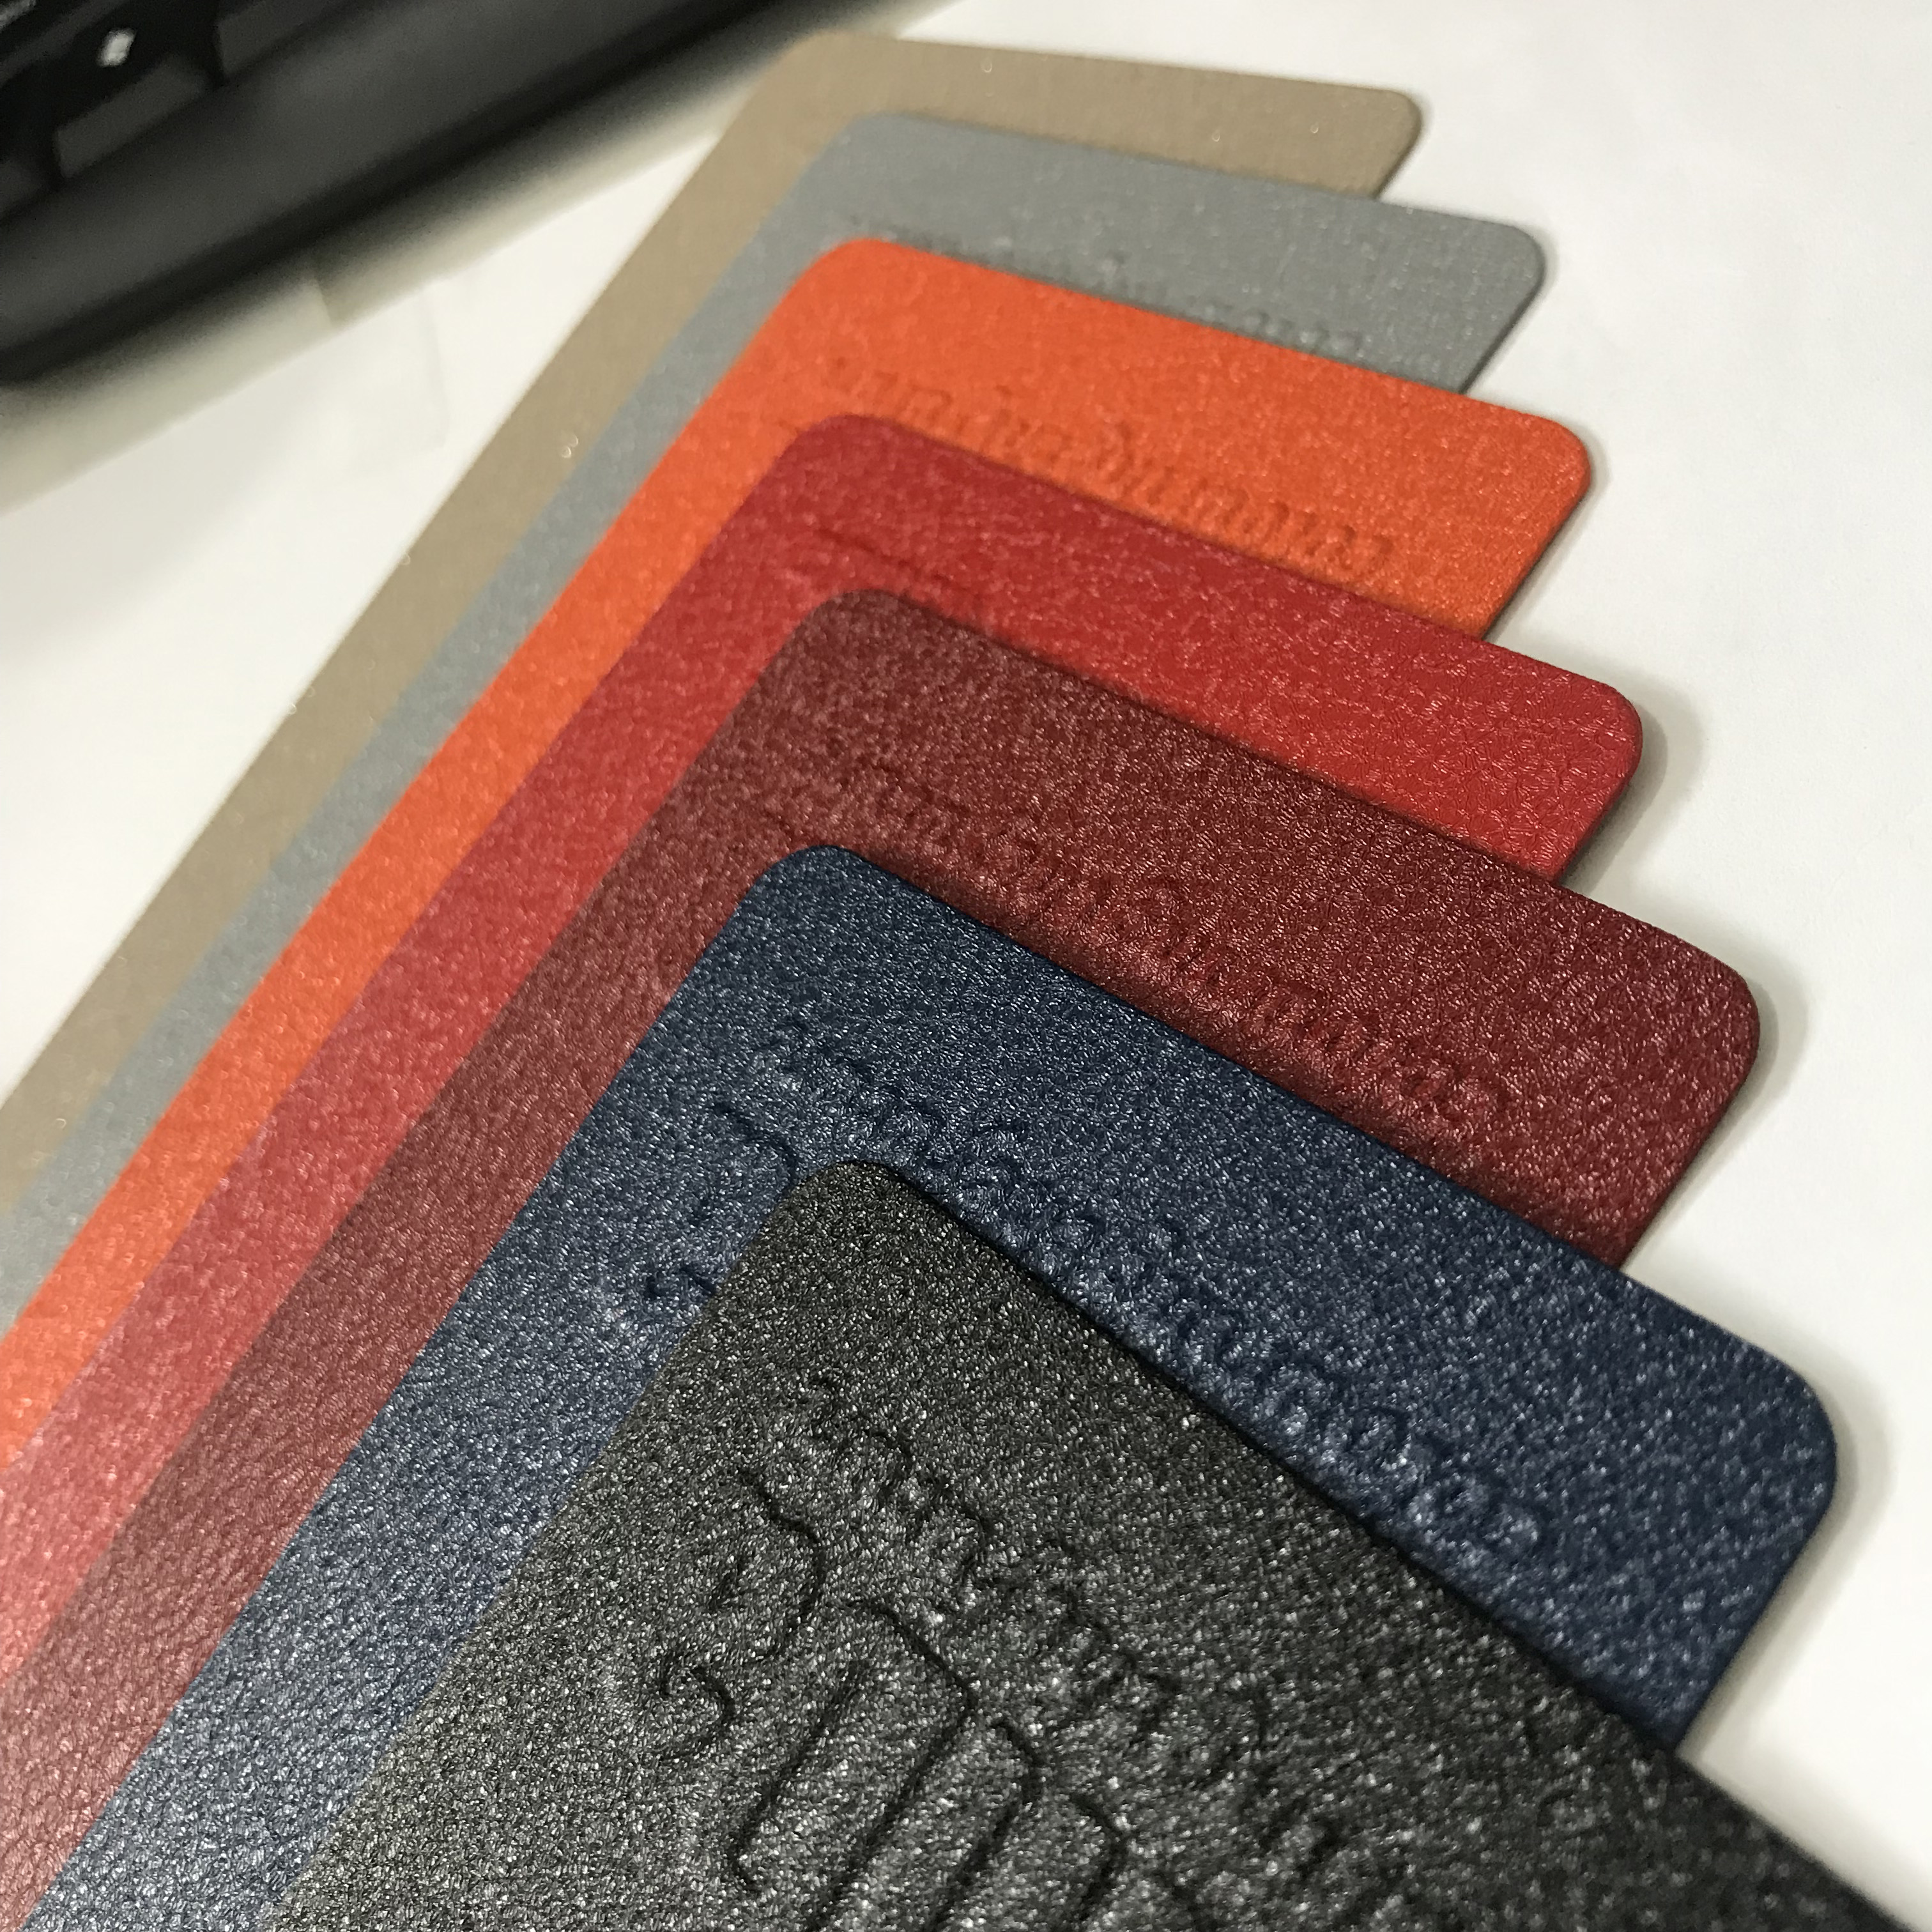 IC Water Texture Thermosetting Powder Coating Paint, Epoxy Polyester Powder Coating Plant For Aluminum